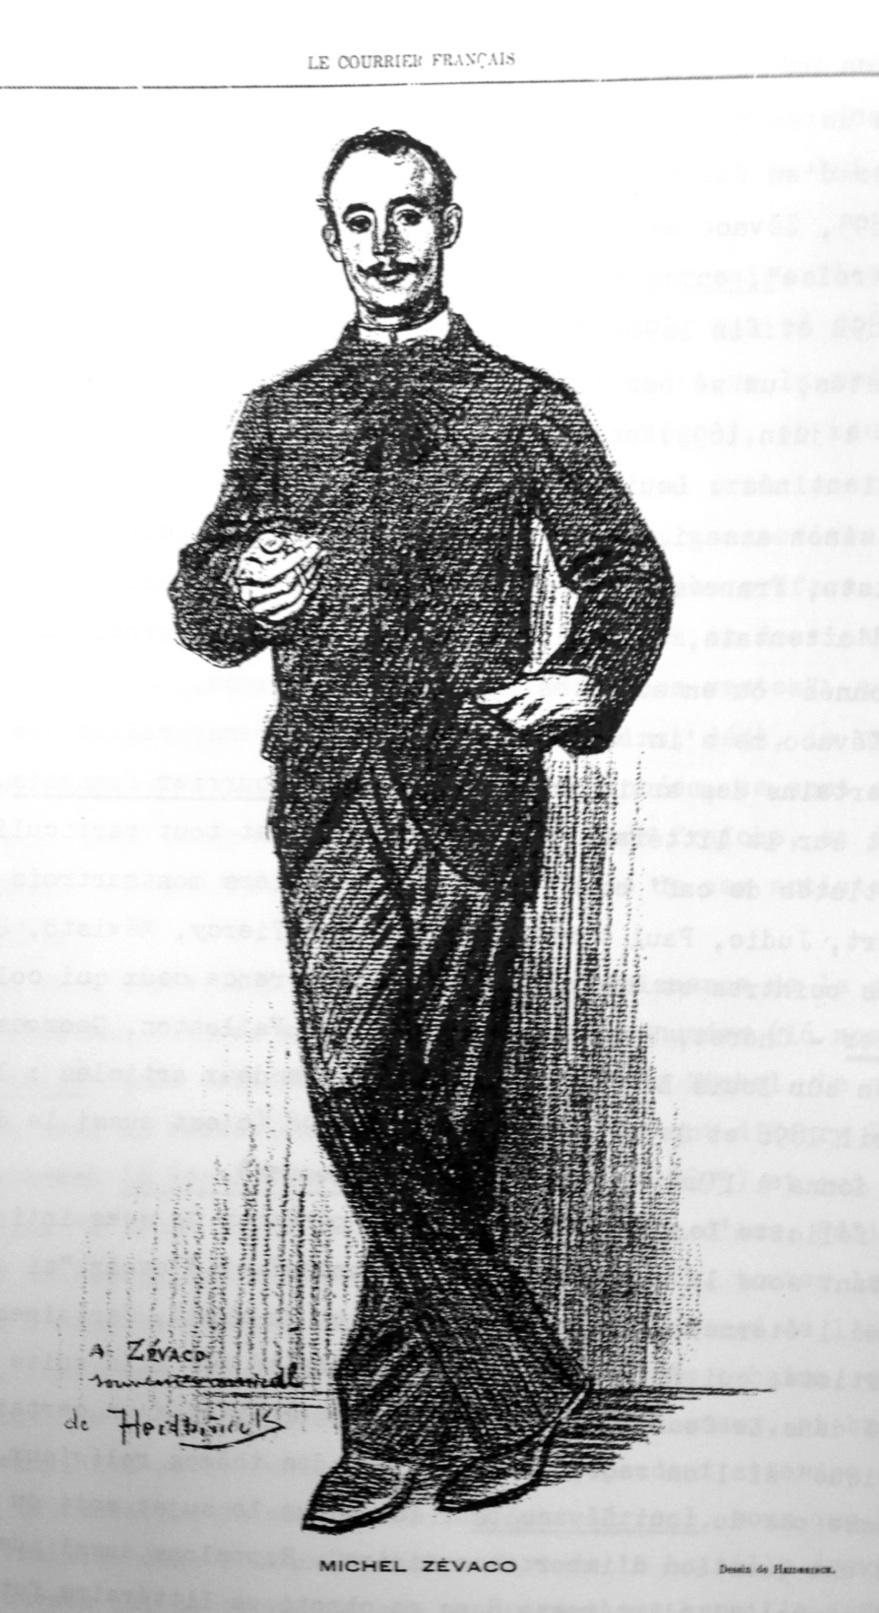 Zevaco par Oswald Heidbrinck dans le Courrier Français du 7 mai 1891